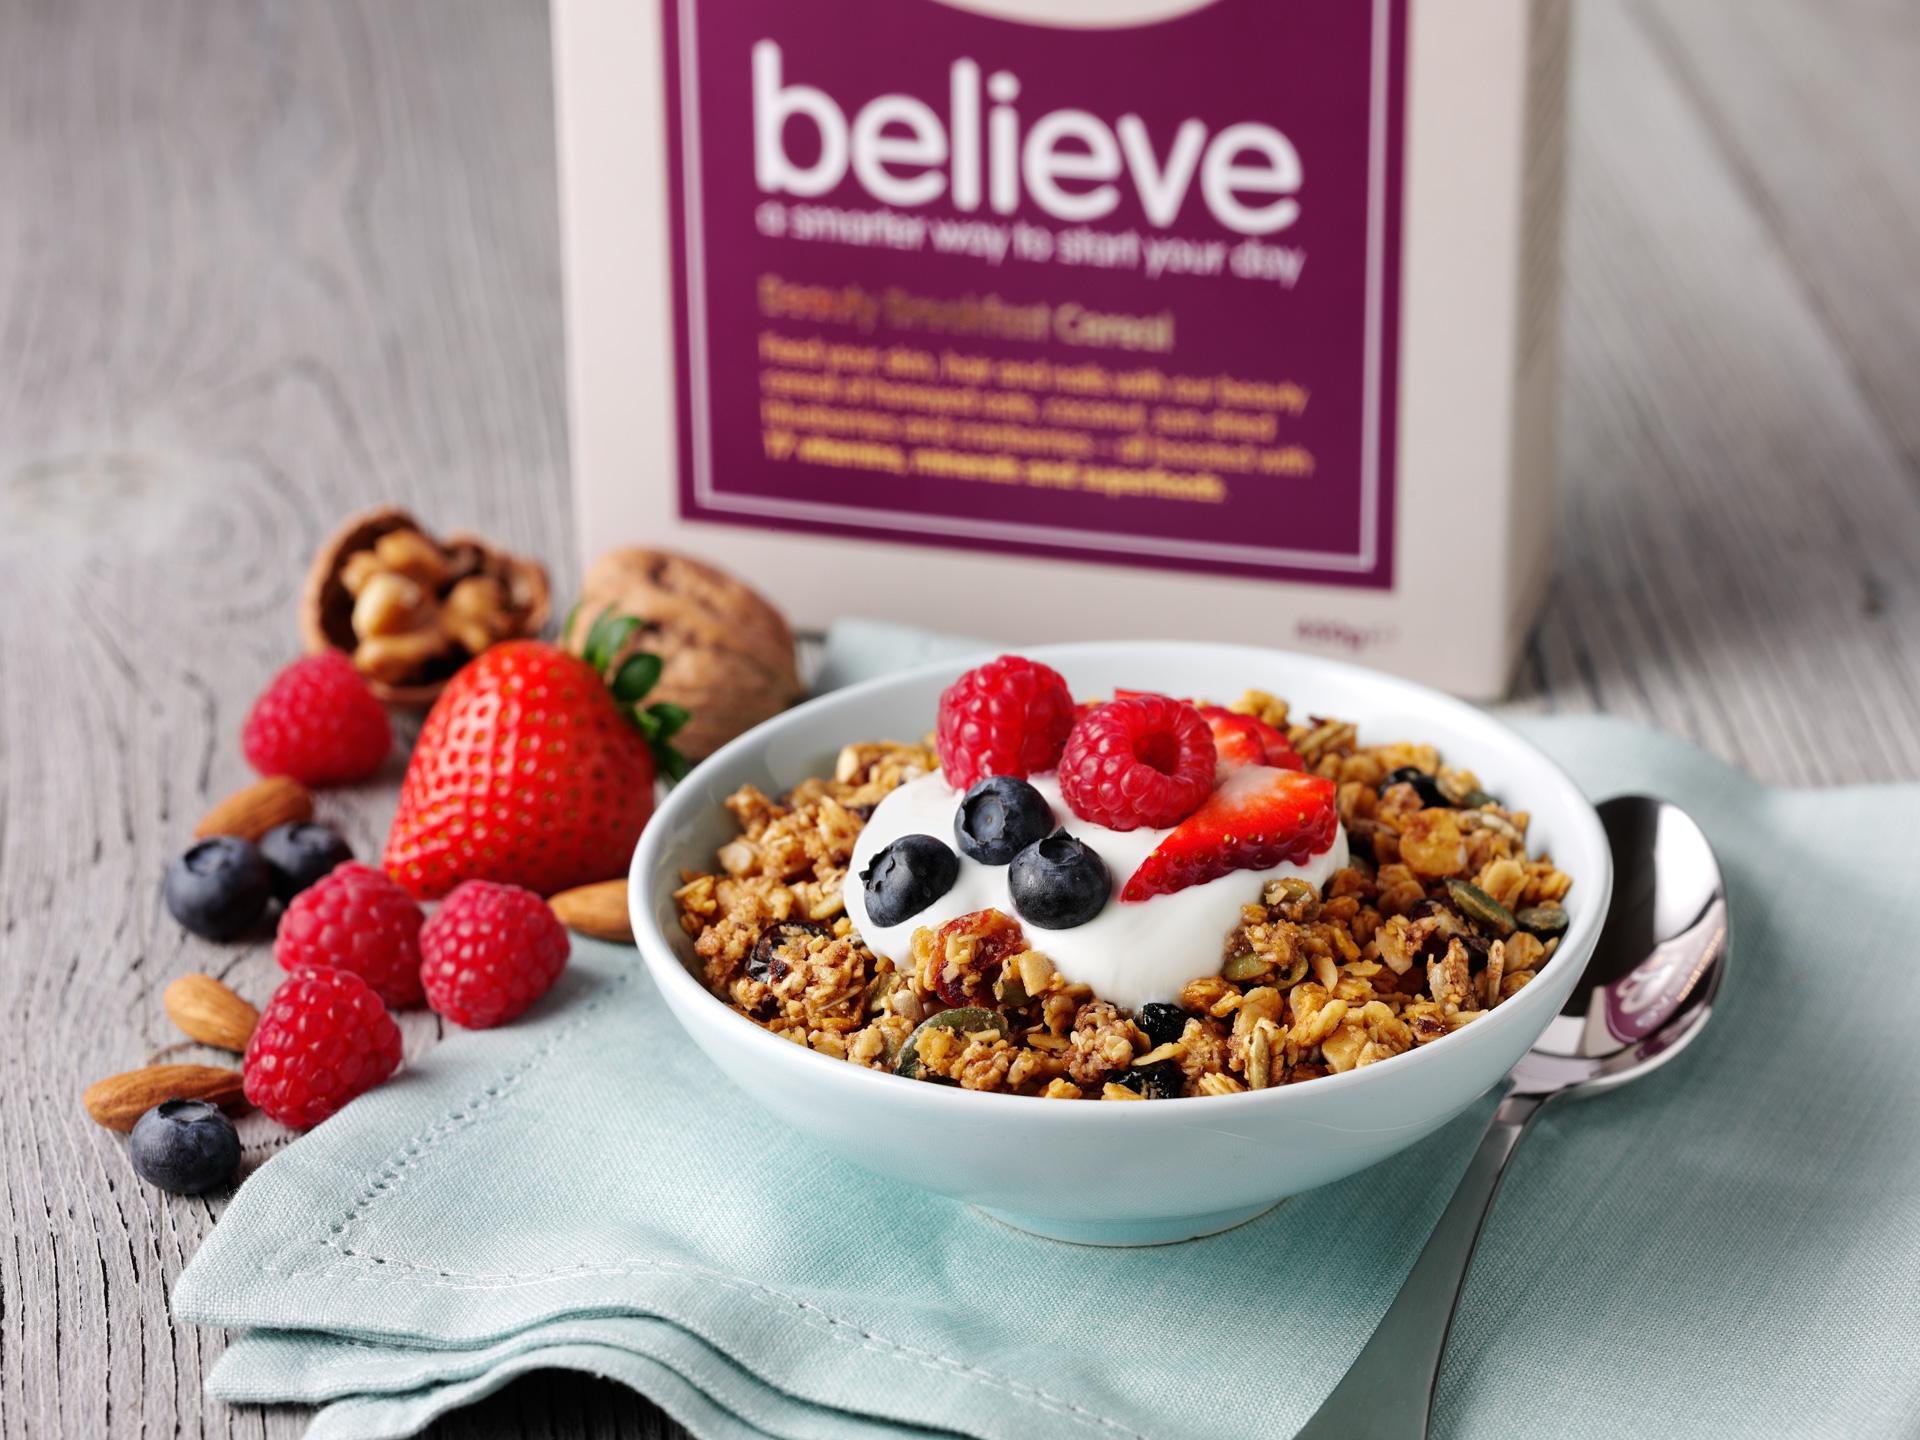 Packaging design for Believe Cereals